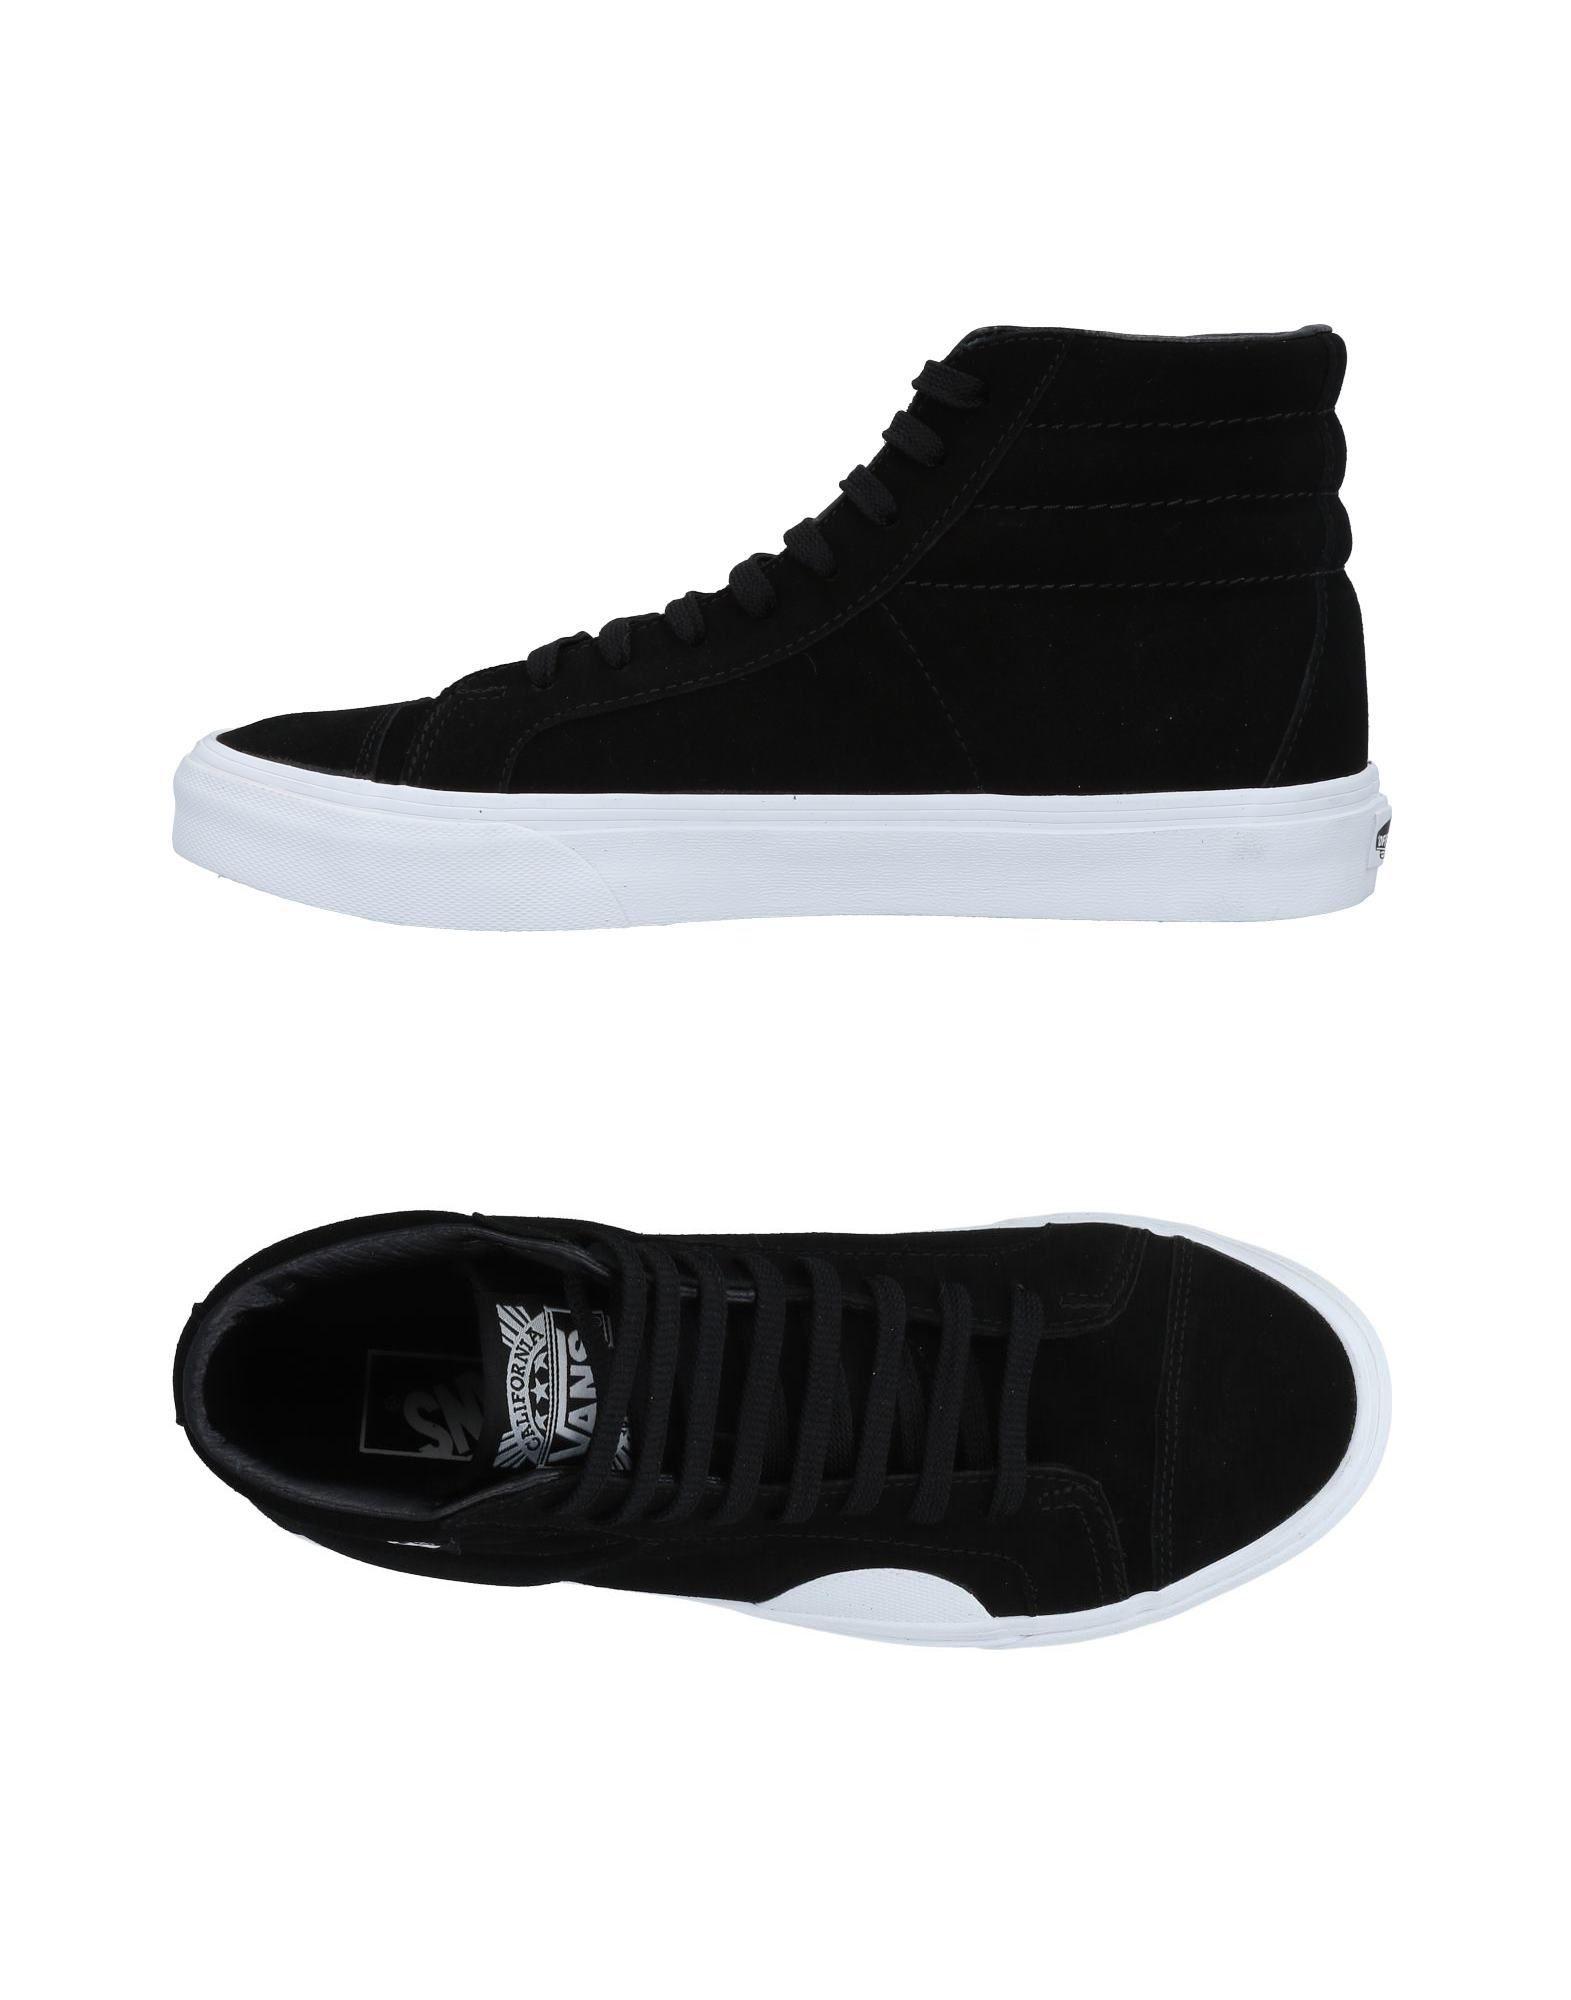 Sneakers Vans Homme - Sneakers Vans  Noir Confortable et belle